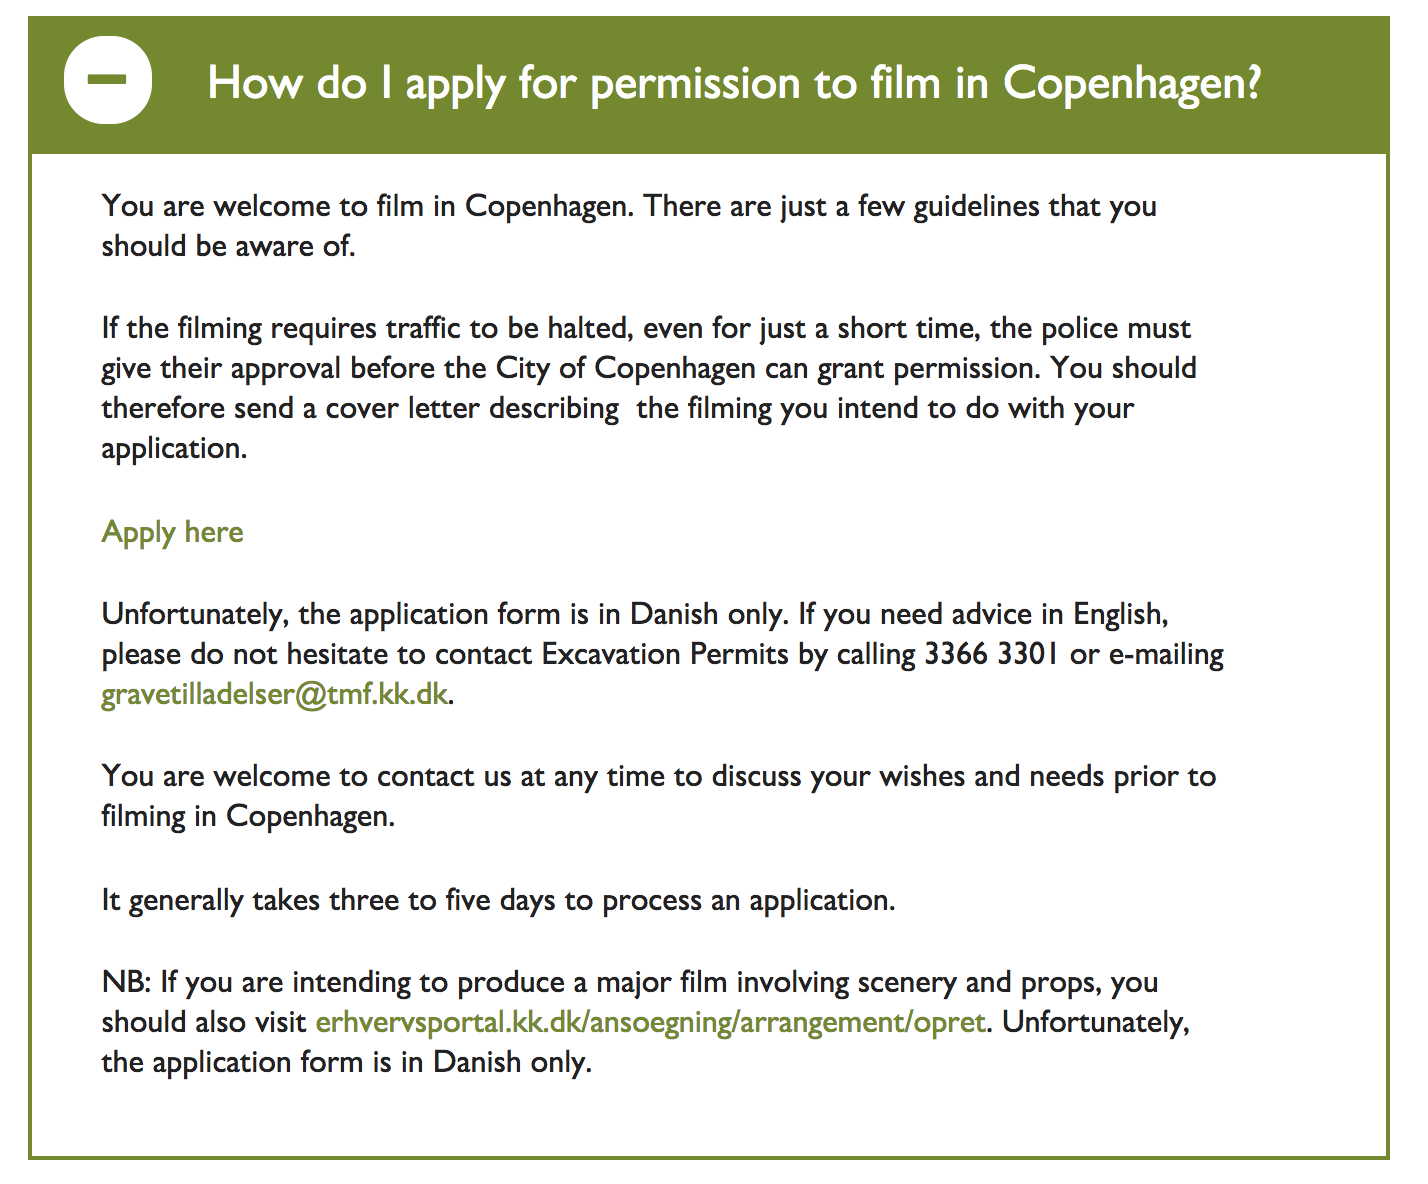 copenhagen film permit application process